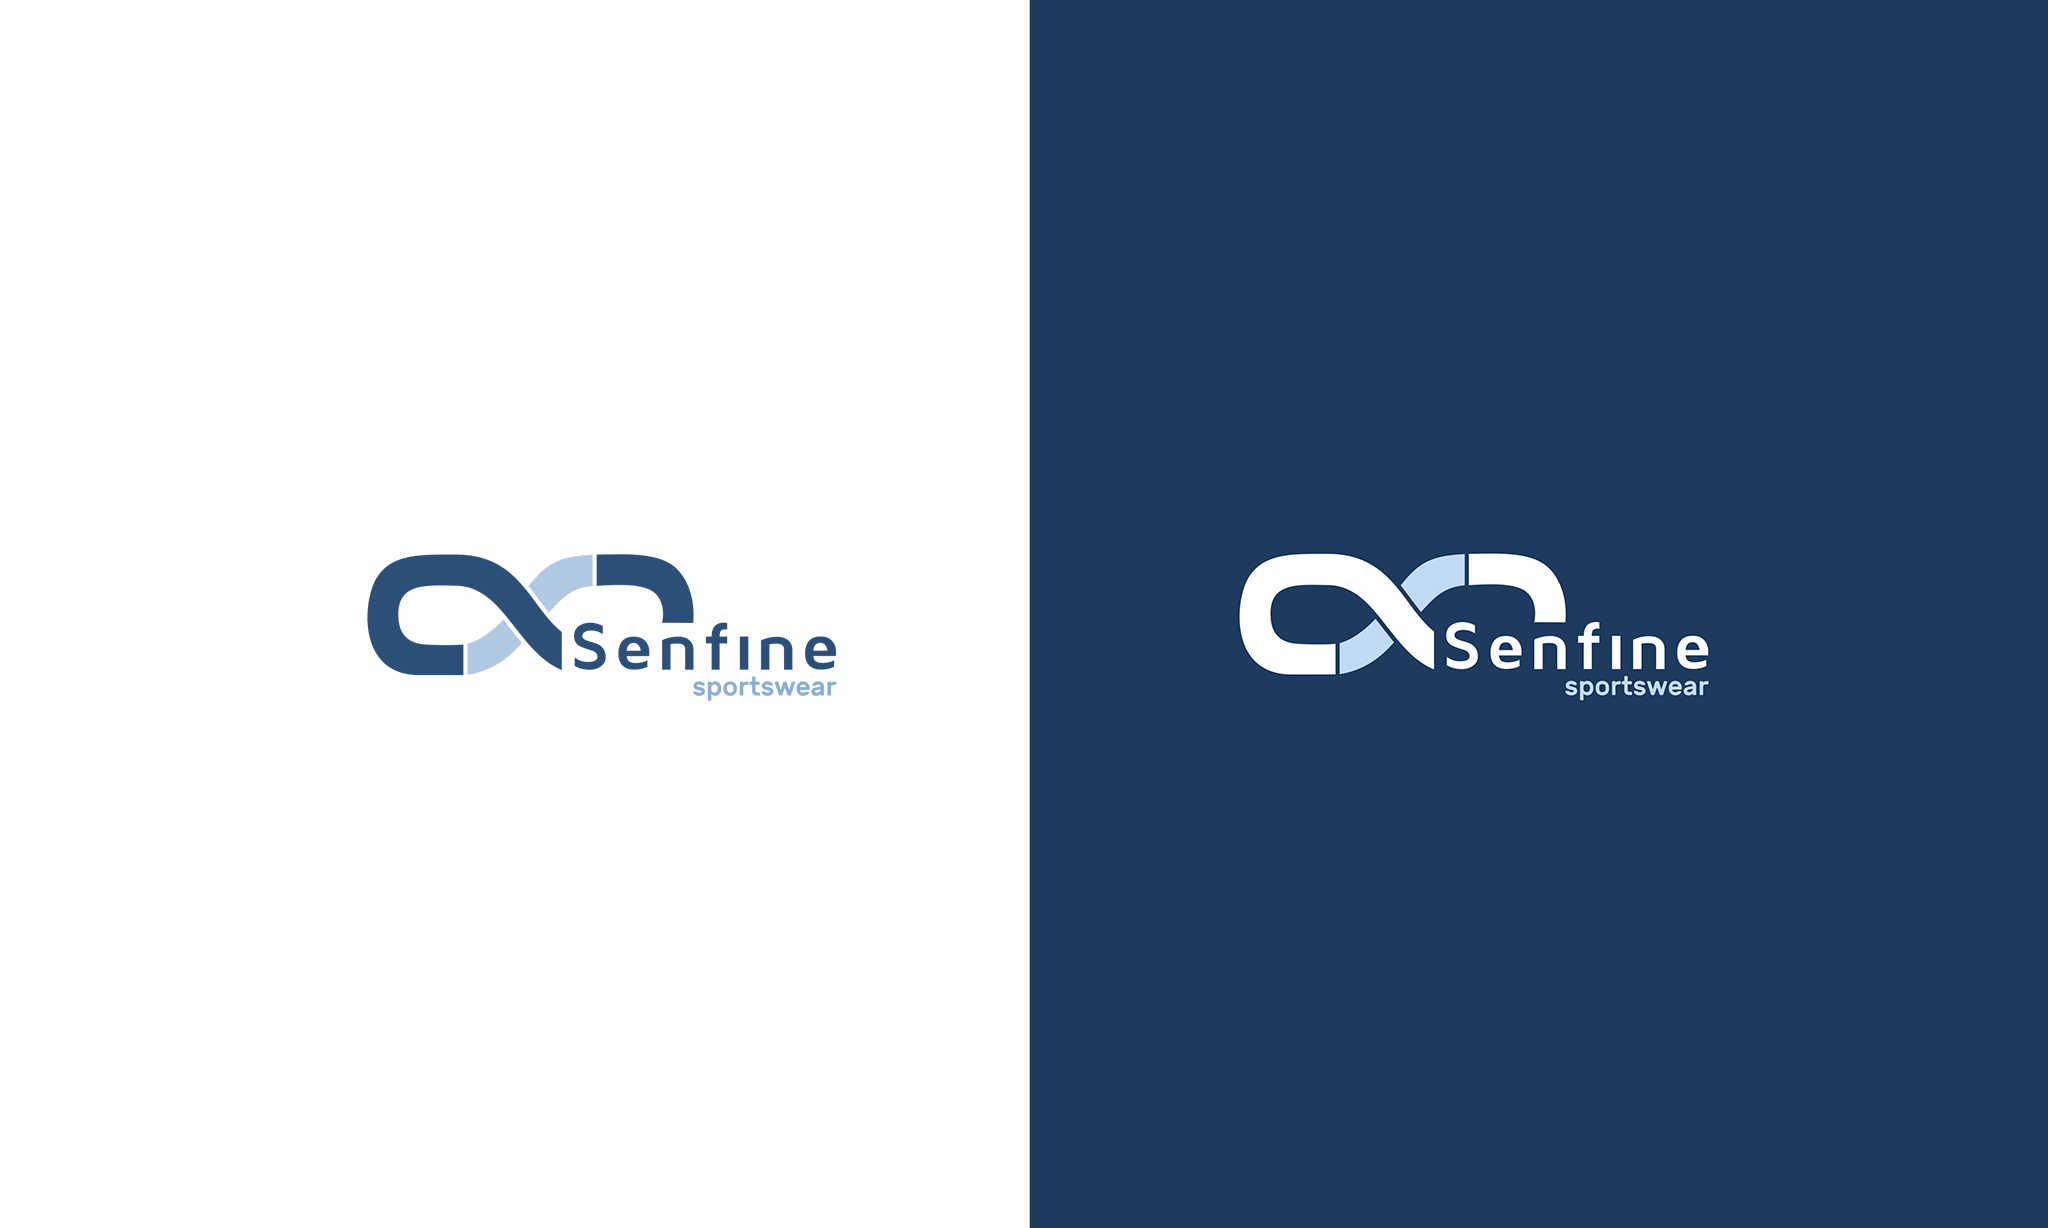 branding-produs-senfine-articole-sportive